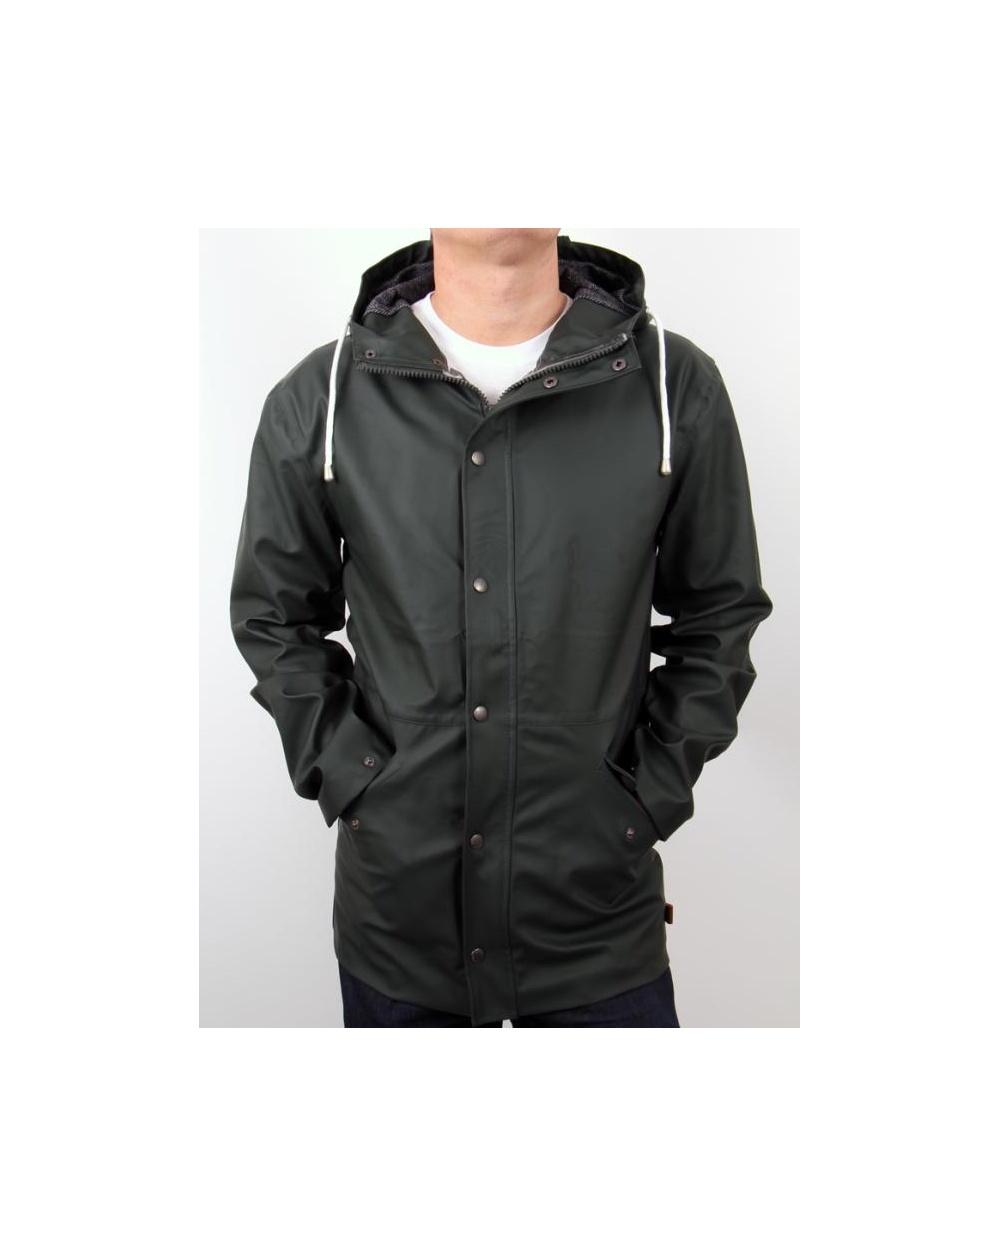 bellfield nikel jacket khaki green bellfield jacket with hood. Black Bedroom Furniture Sets. Home Design Ideas